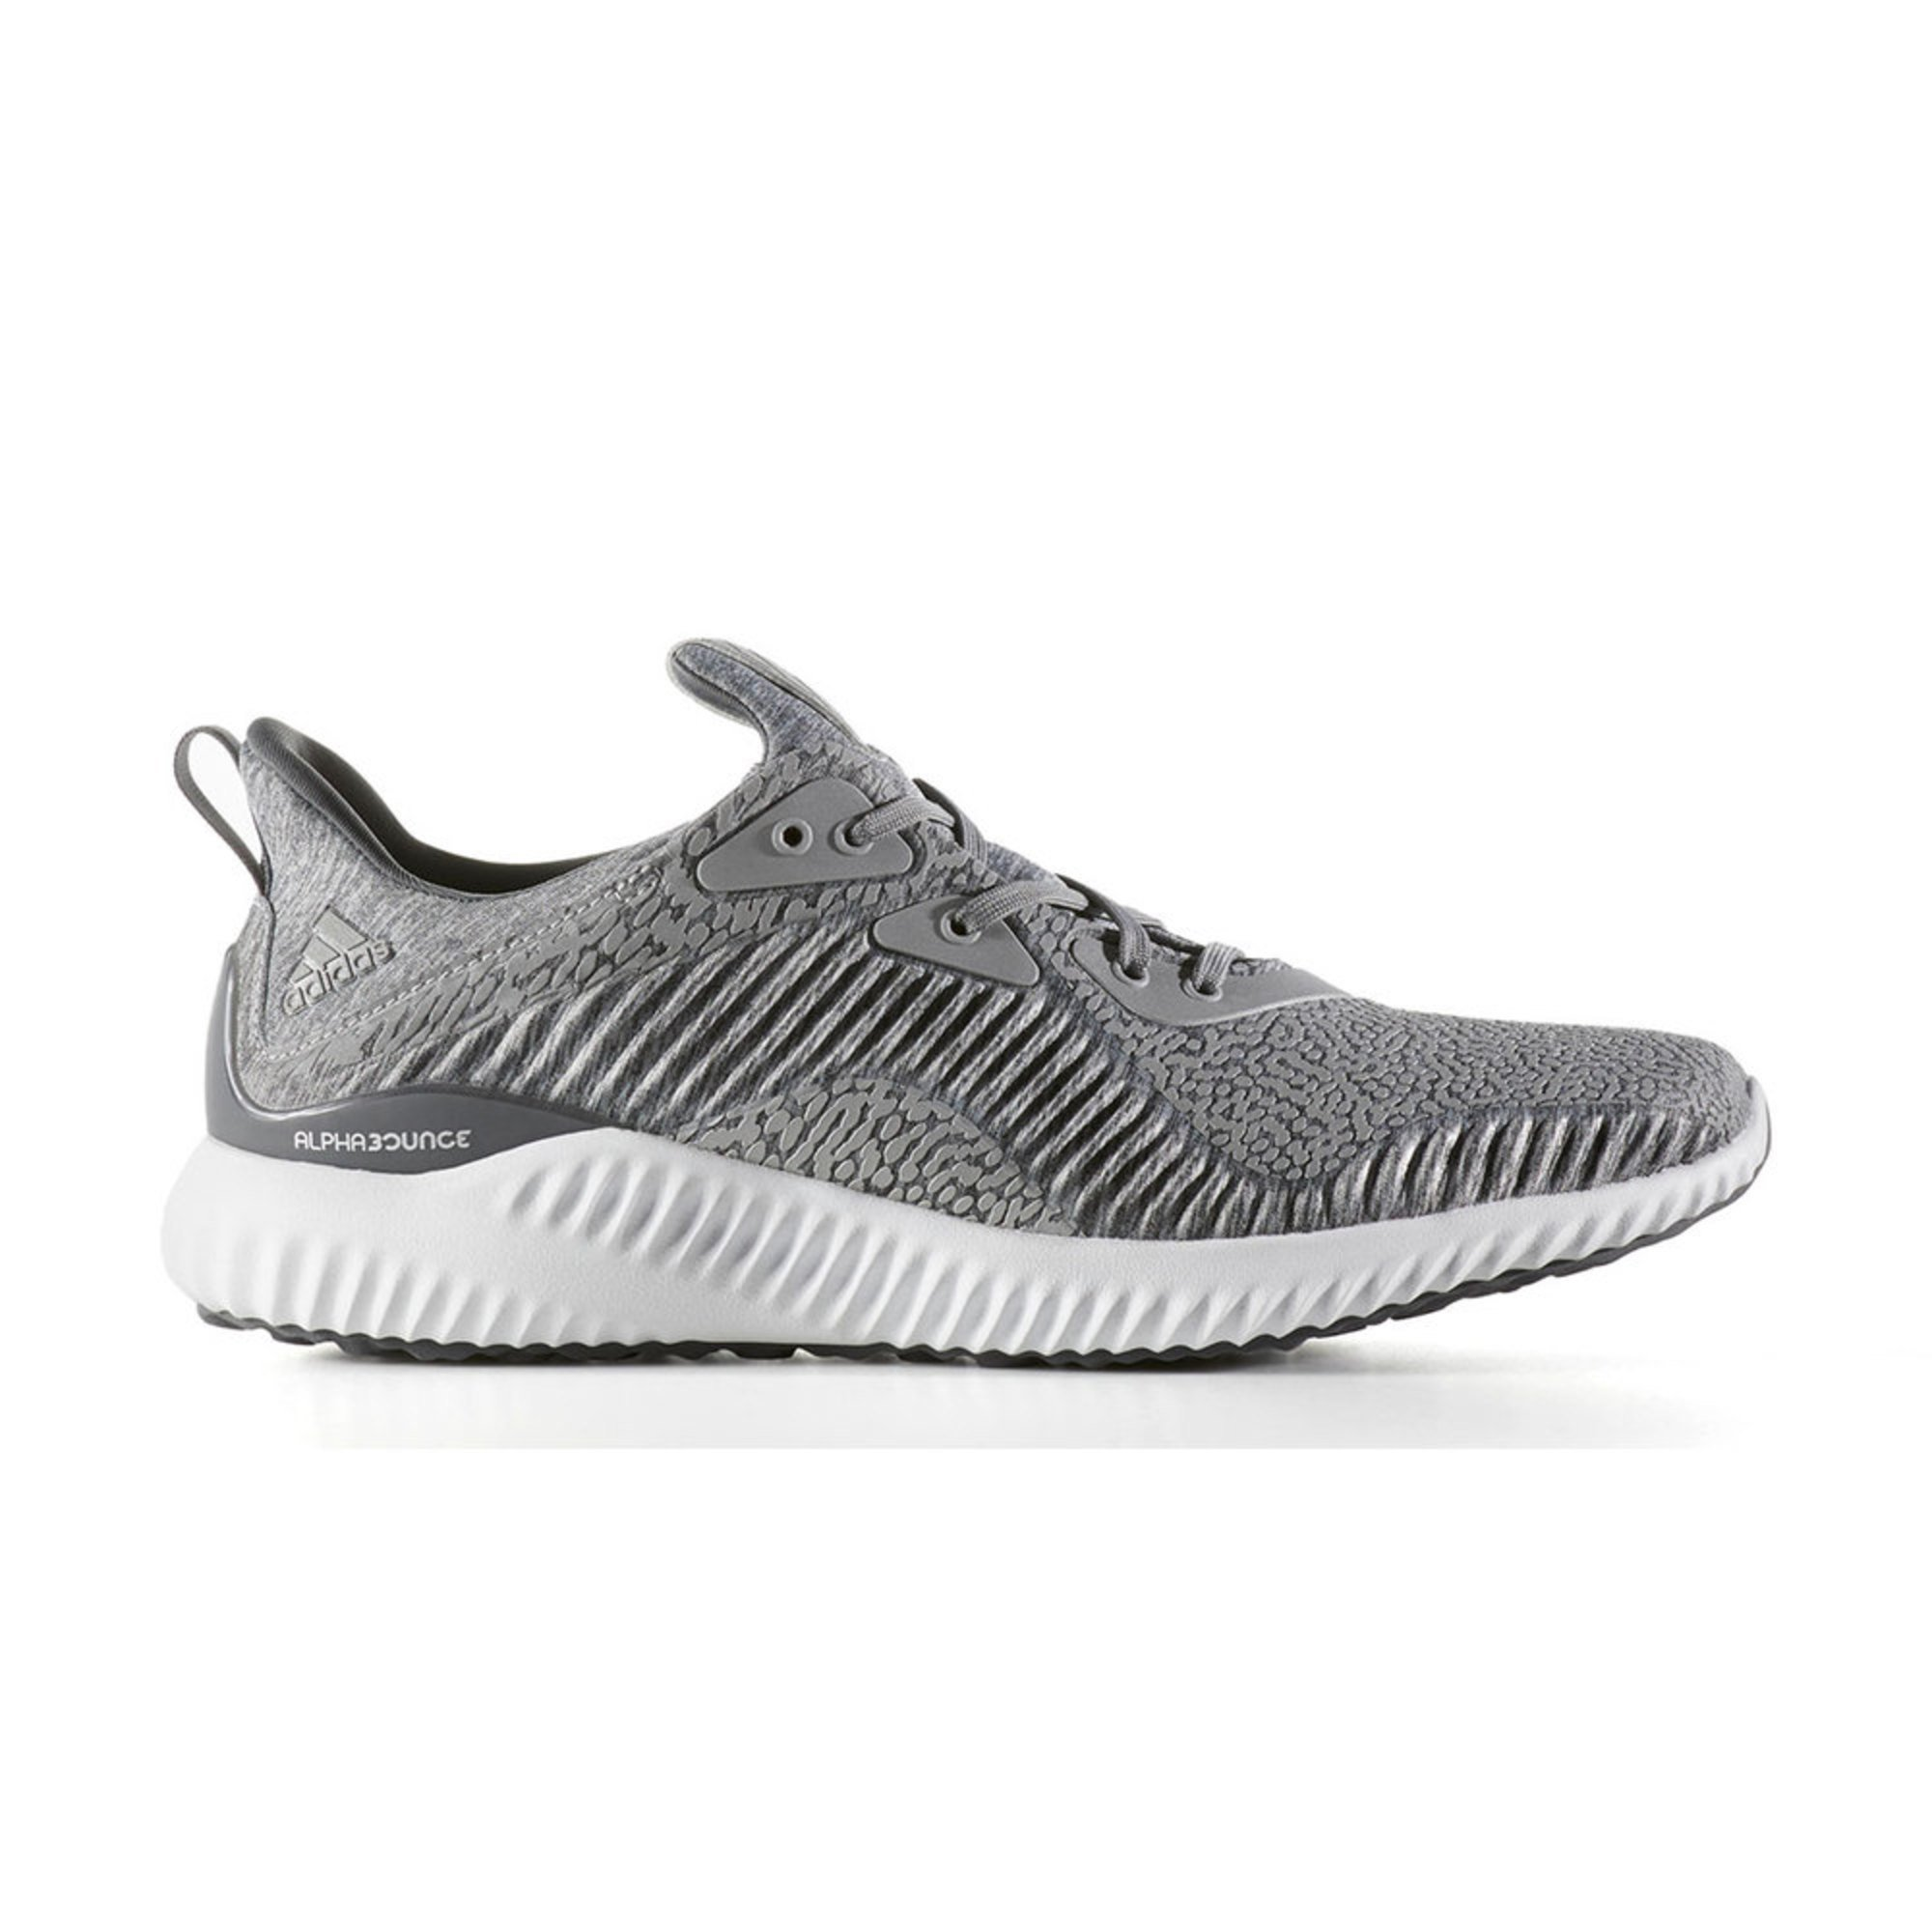 adidas. Adidas AlphaBounce Aramis Men's Running Shoe ...